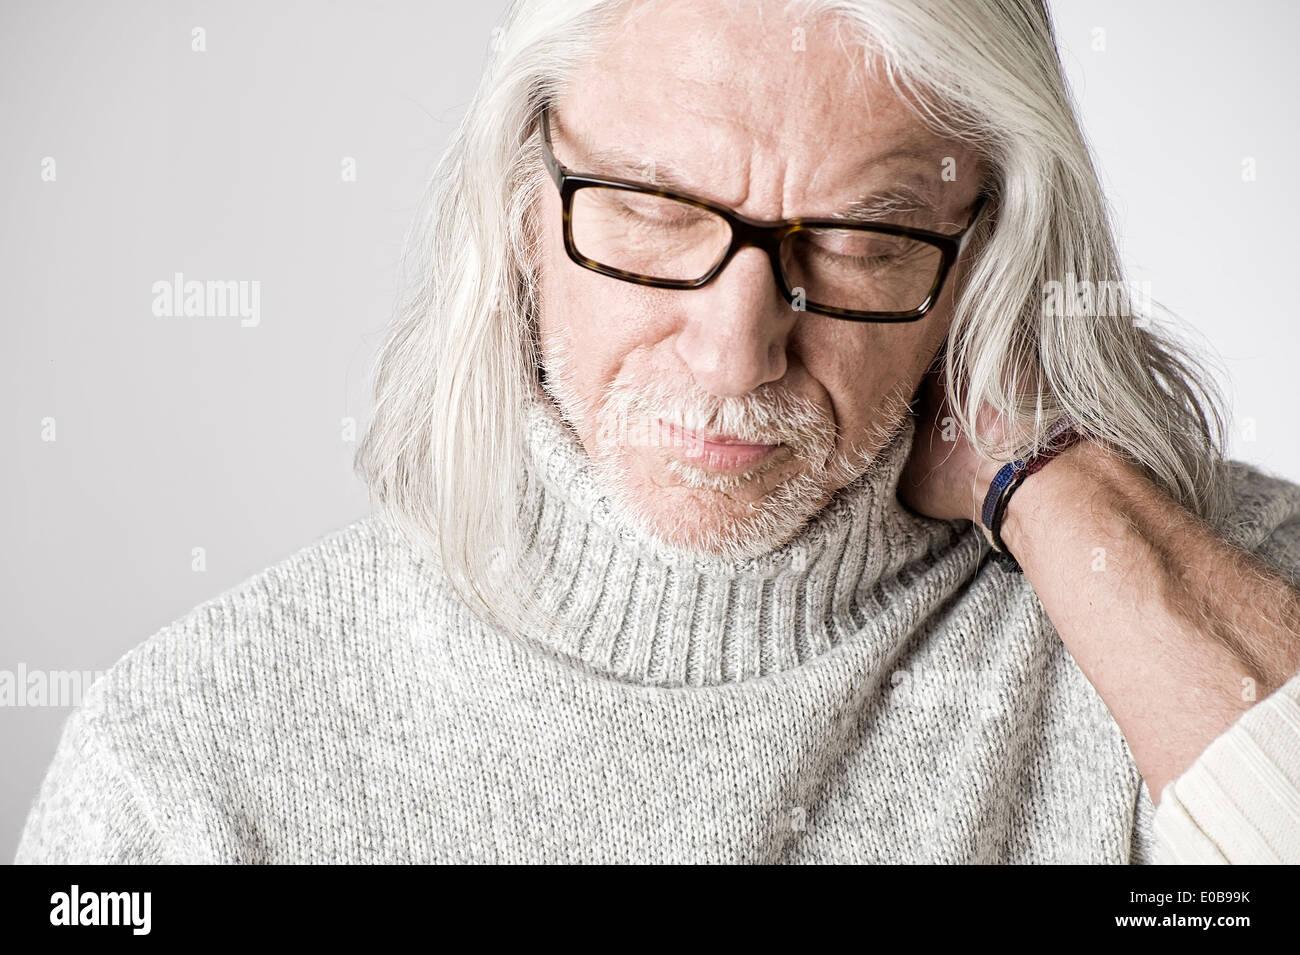 Portrait of mature man, eyes closed, hand on head - Stock Image